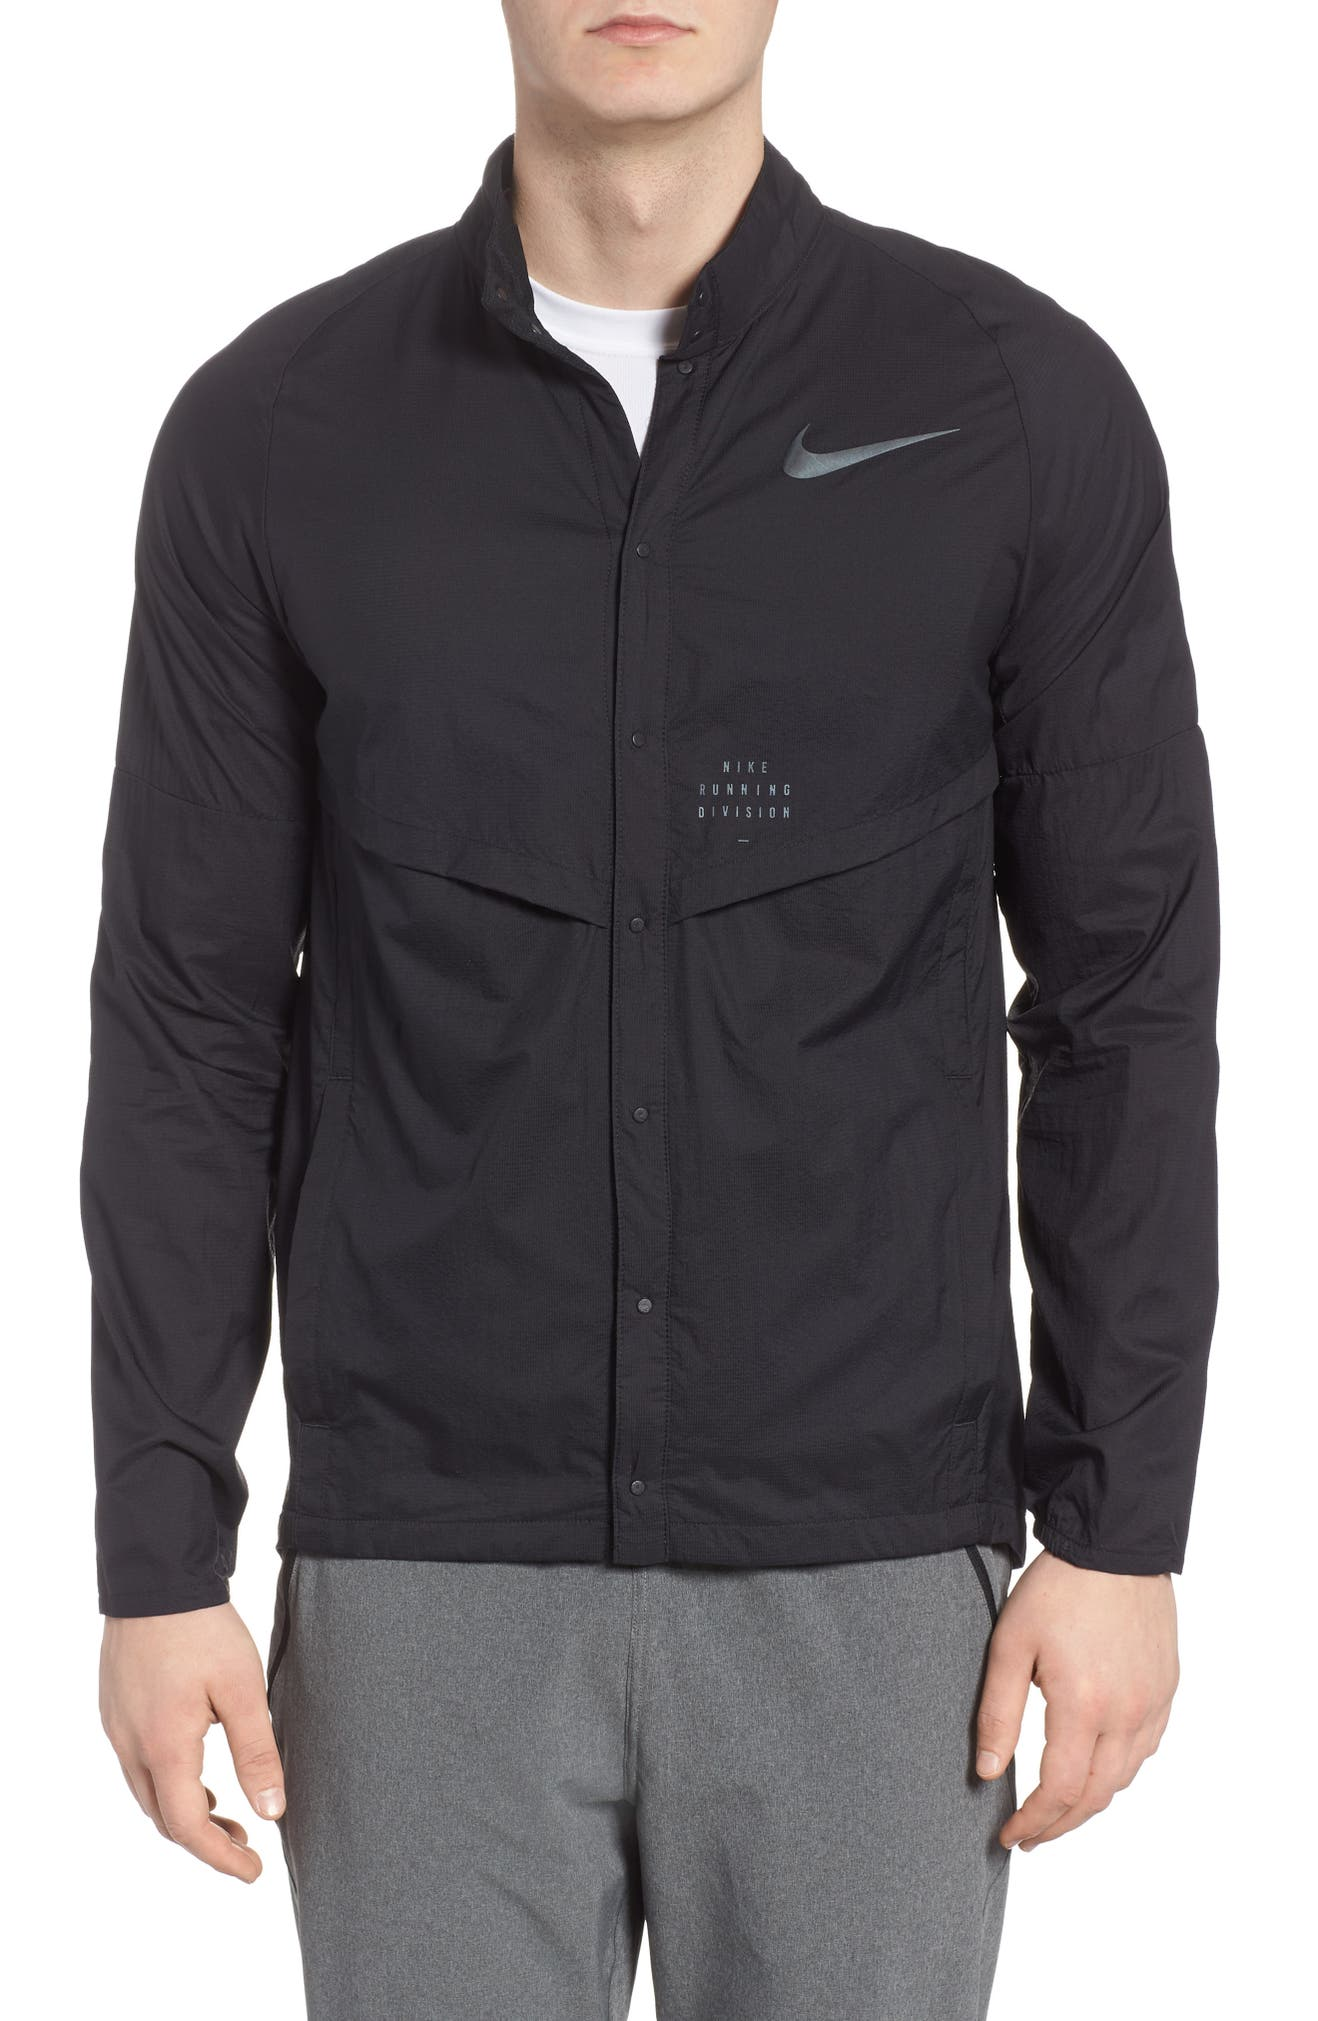 2dea16ee6c4732 Nike Run Division Jacket